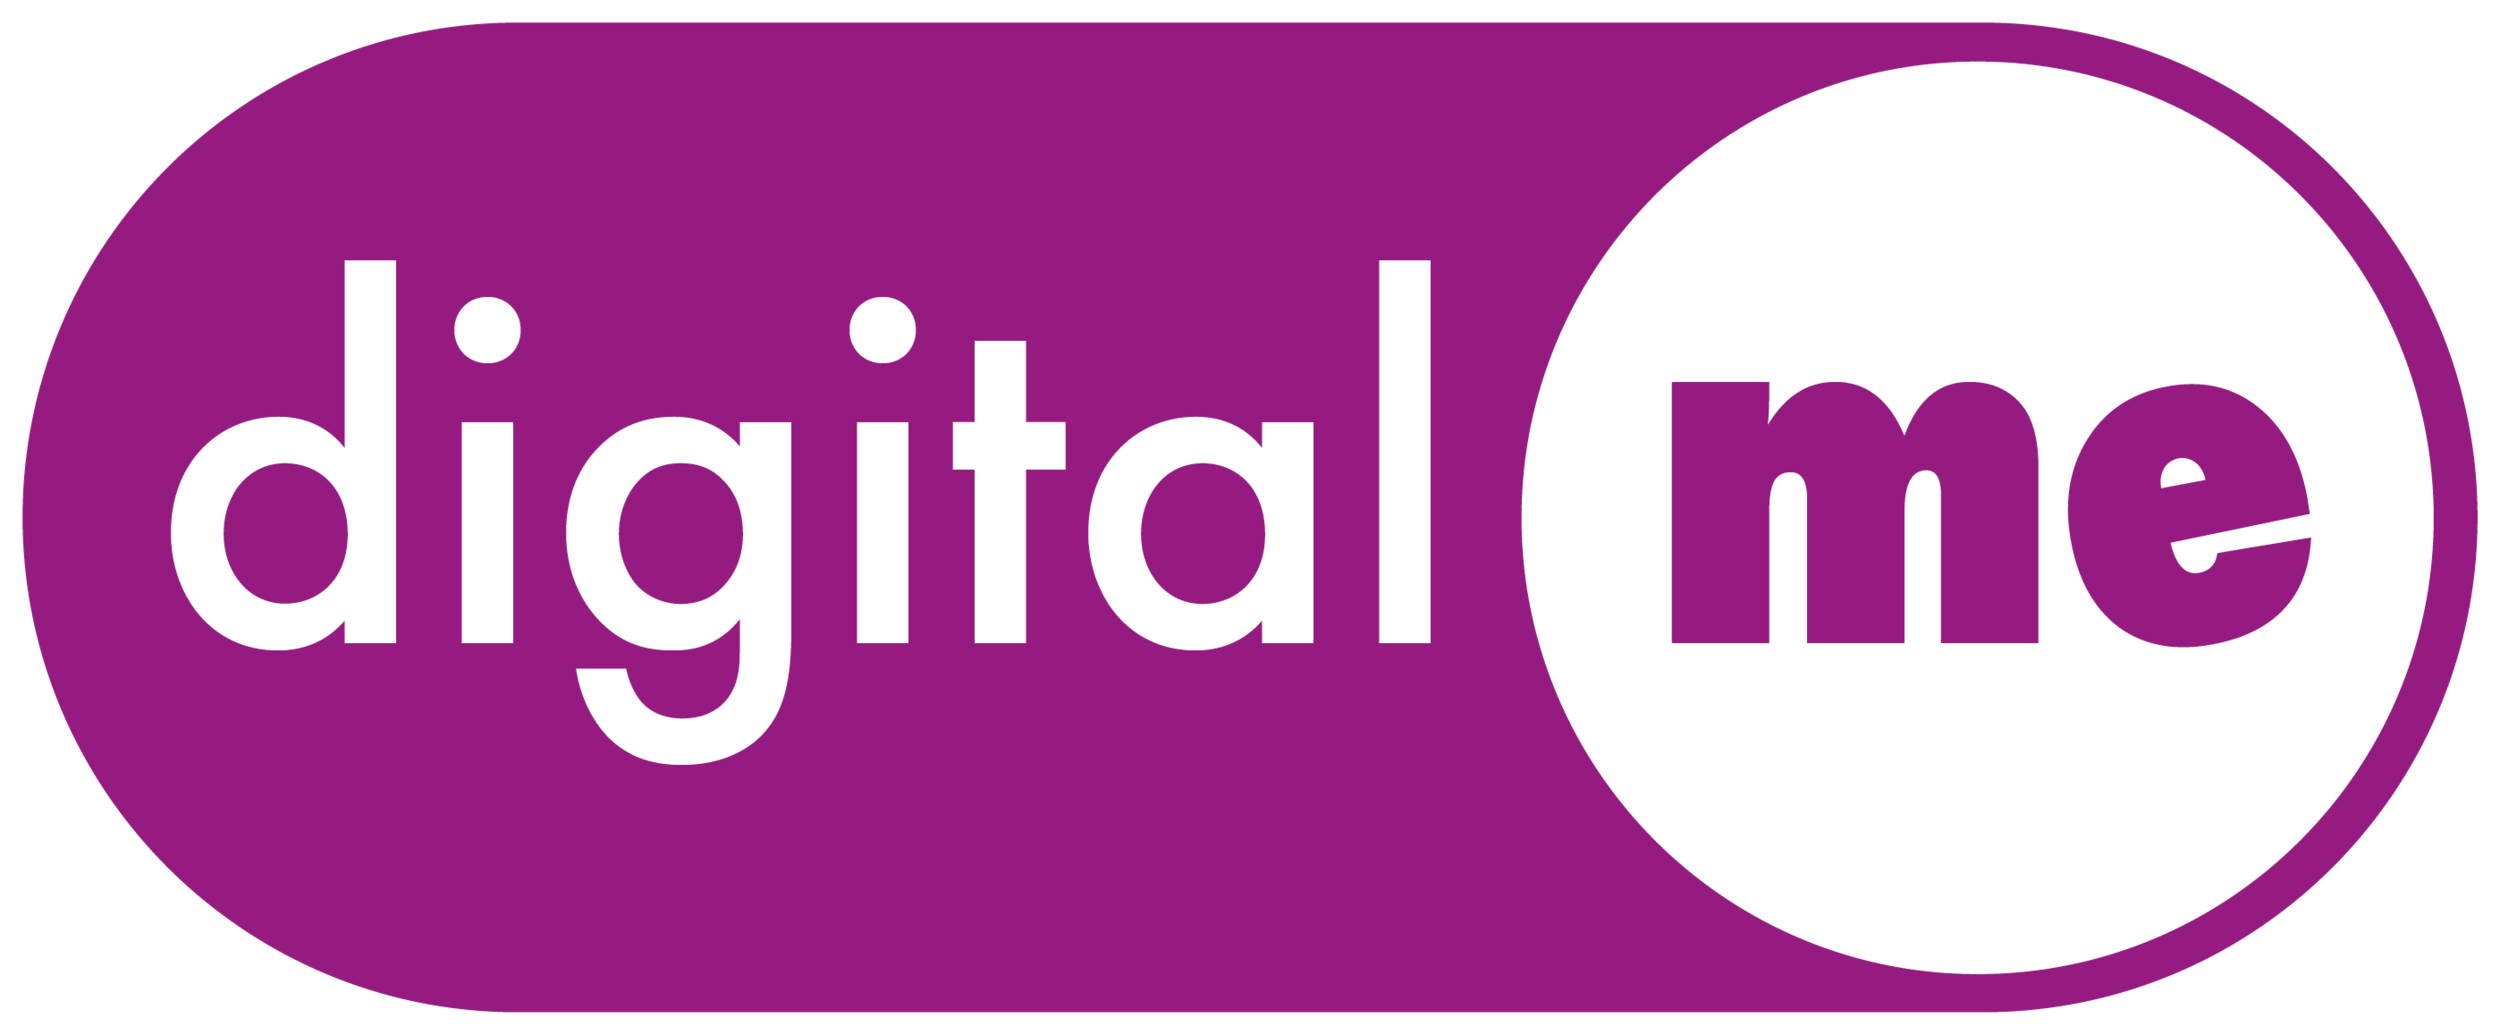 digitalme black country logo